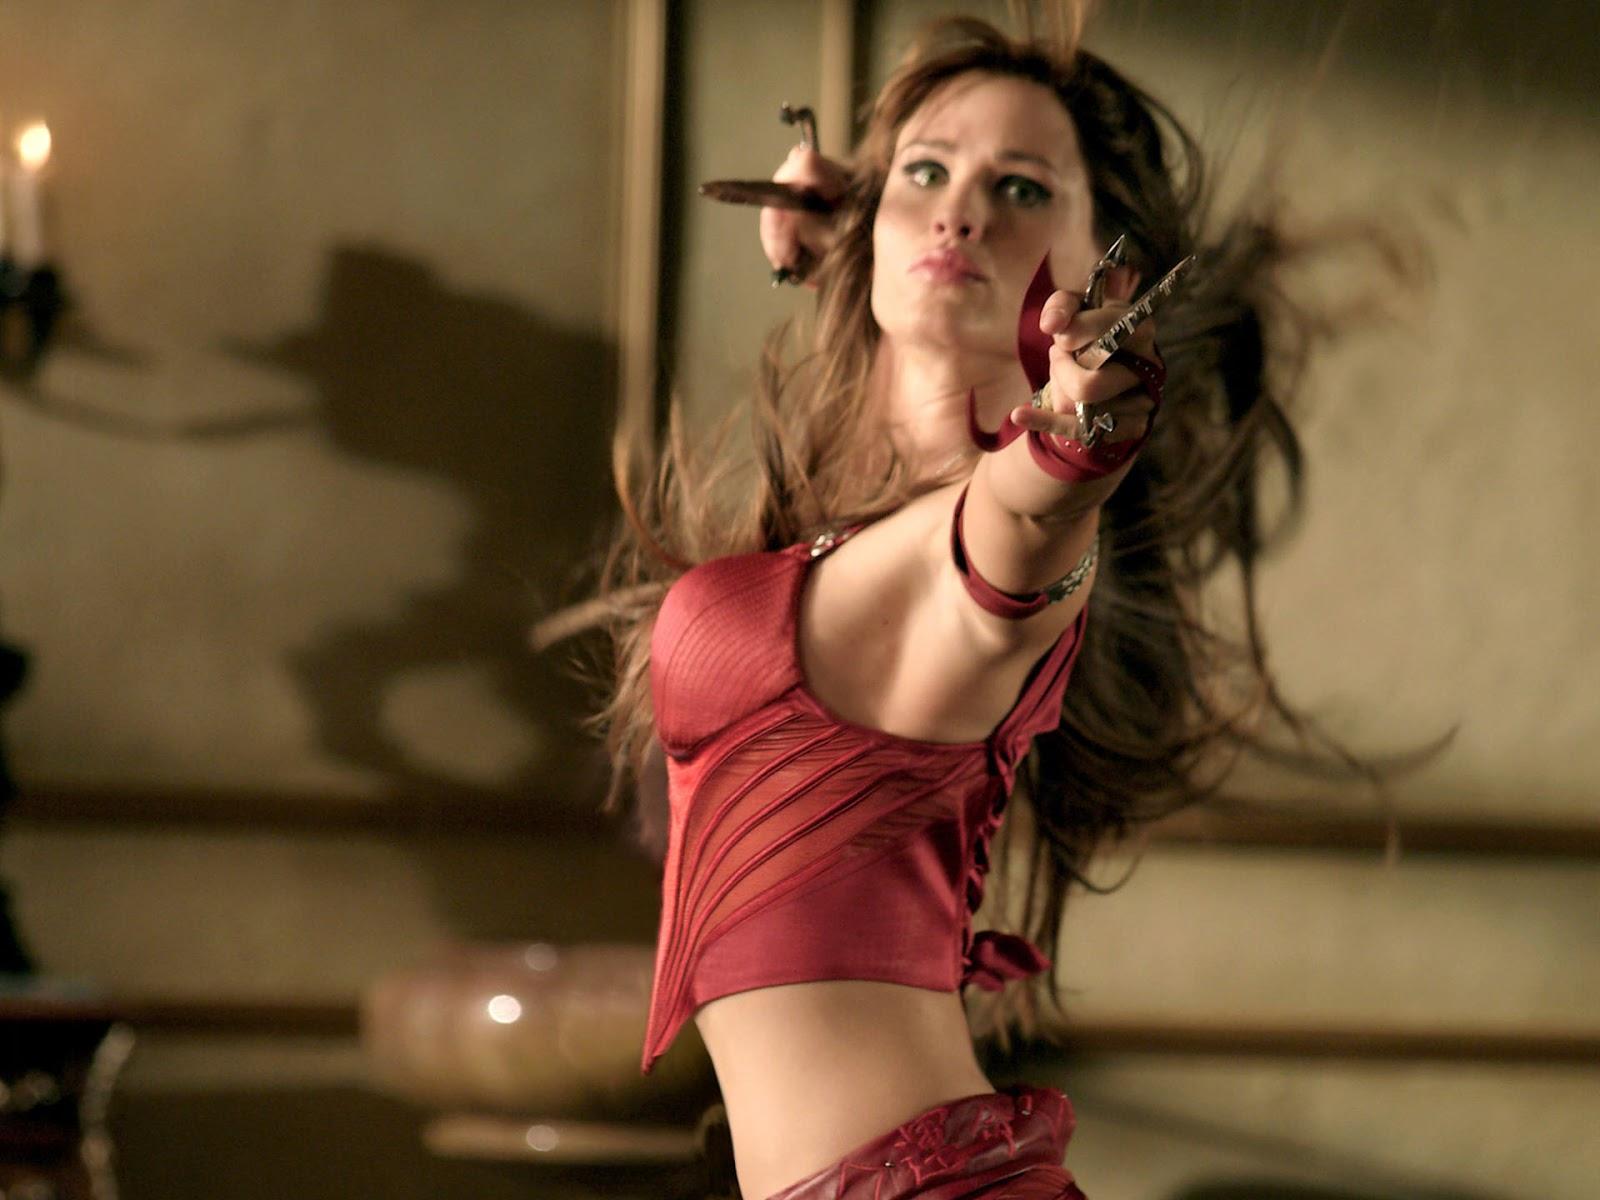 http://4.bp.blogspot.com/-MwP3KhZjuQY/UMNuDeTF3oI/AAAAAAAAB4M/oLJm0TRFRNY/s1600/12-Hottest-Female-Superheroes-You\'ve-Seen-in-Movies+(4).jpg